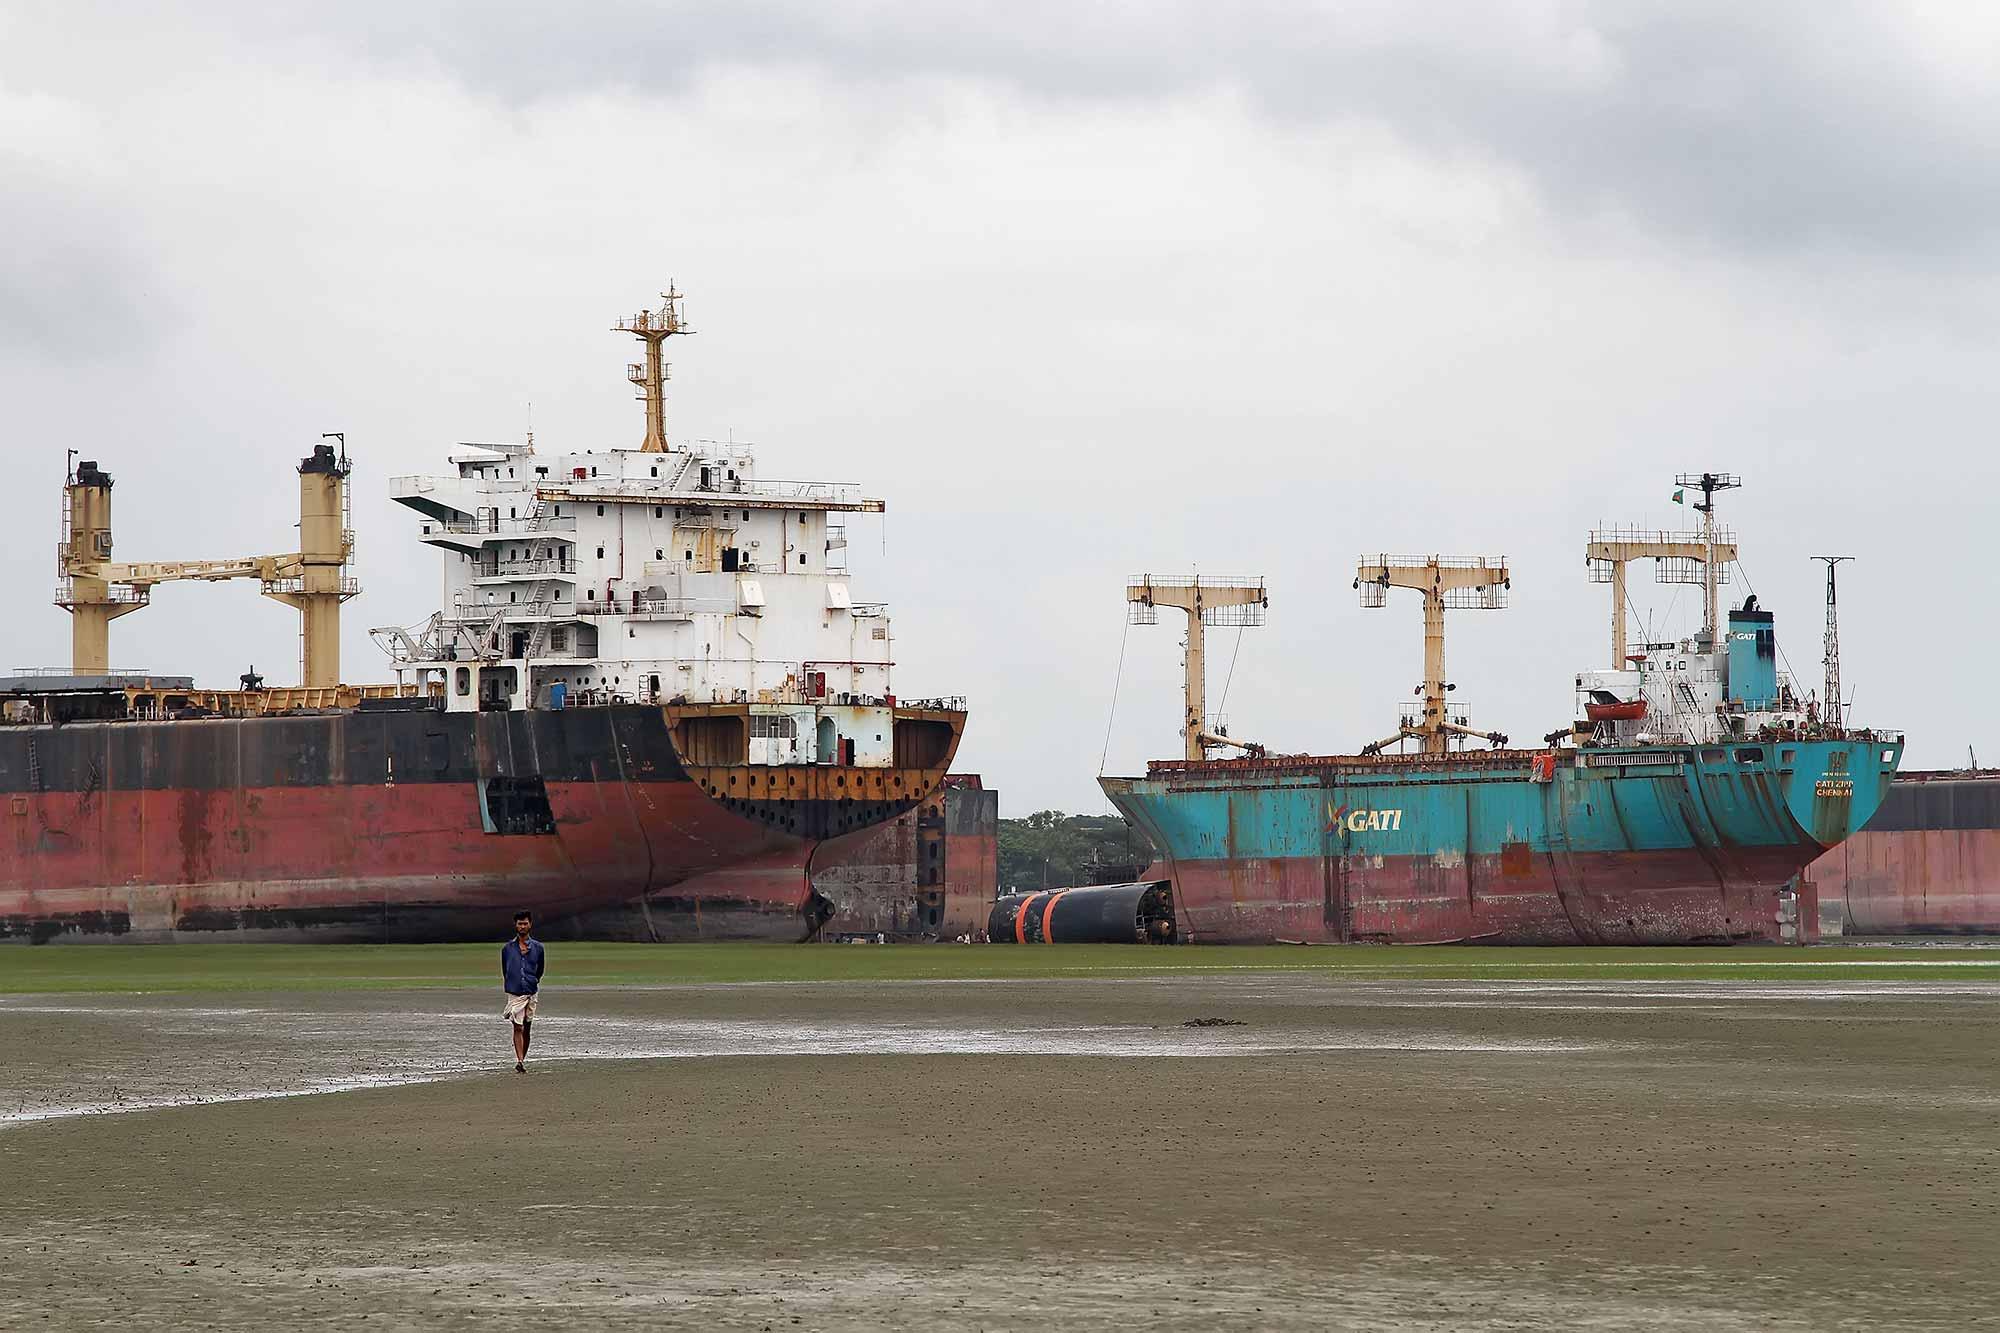 chittagong-ship-breaking-yard-bangladesh-3